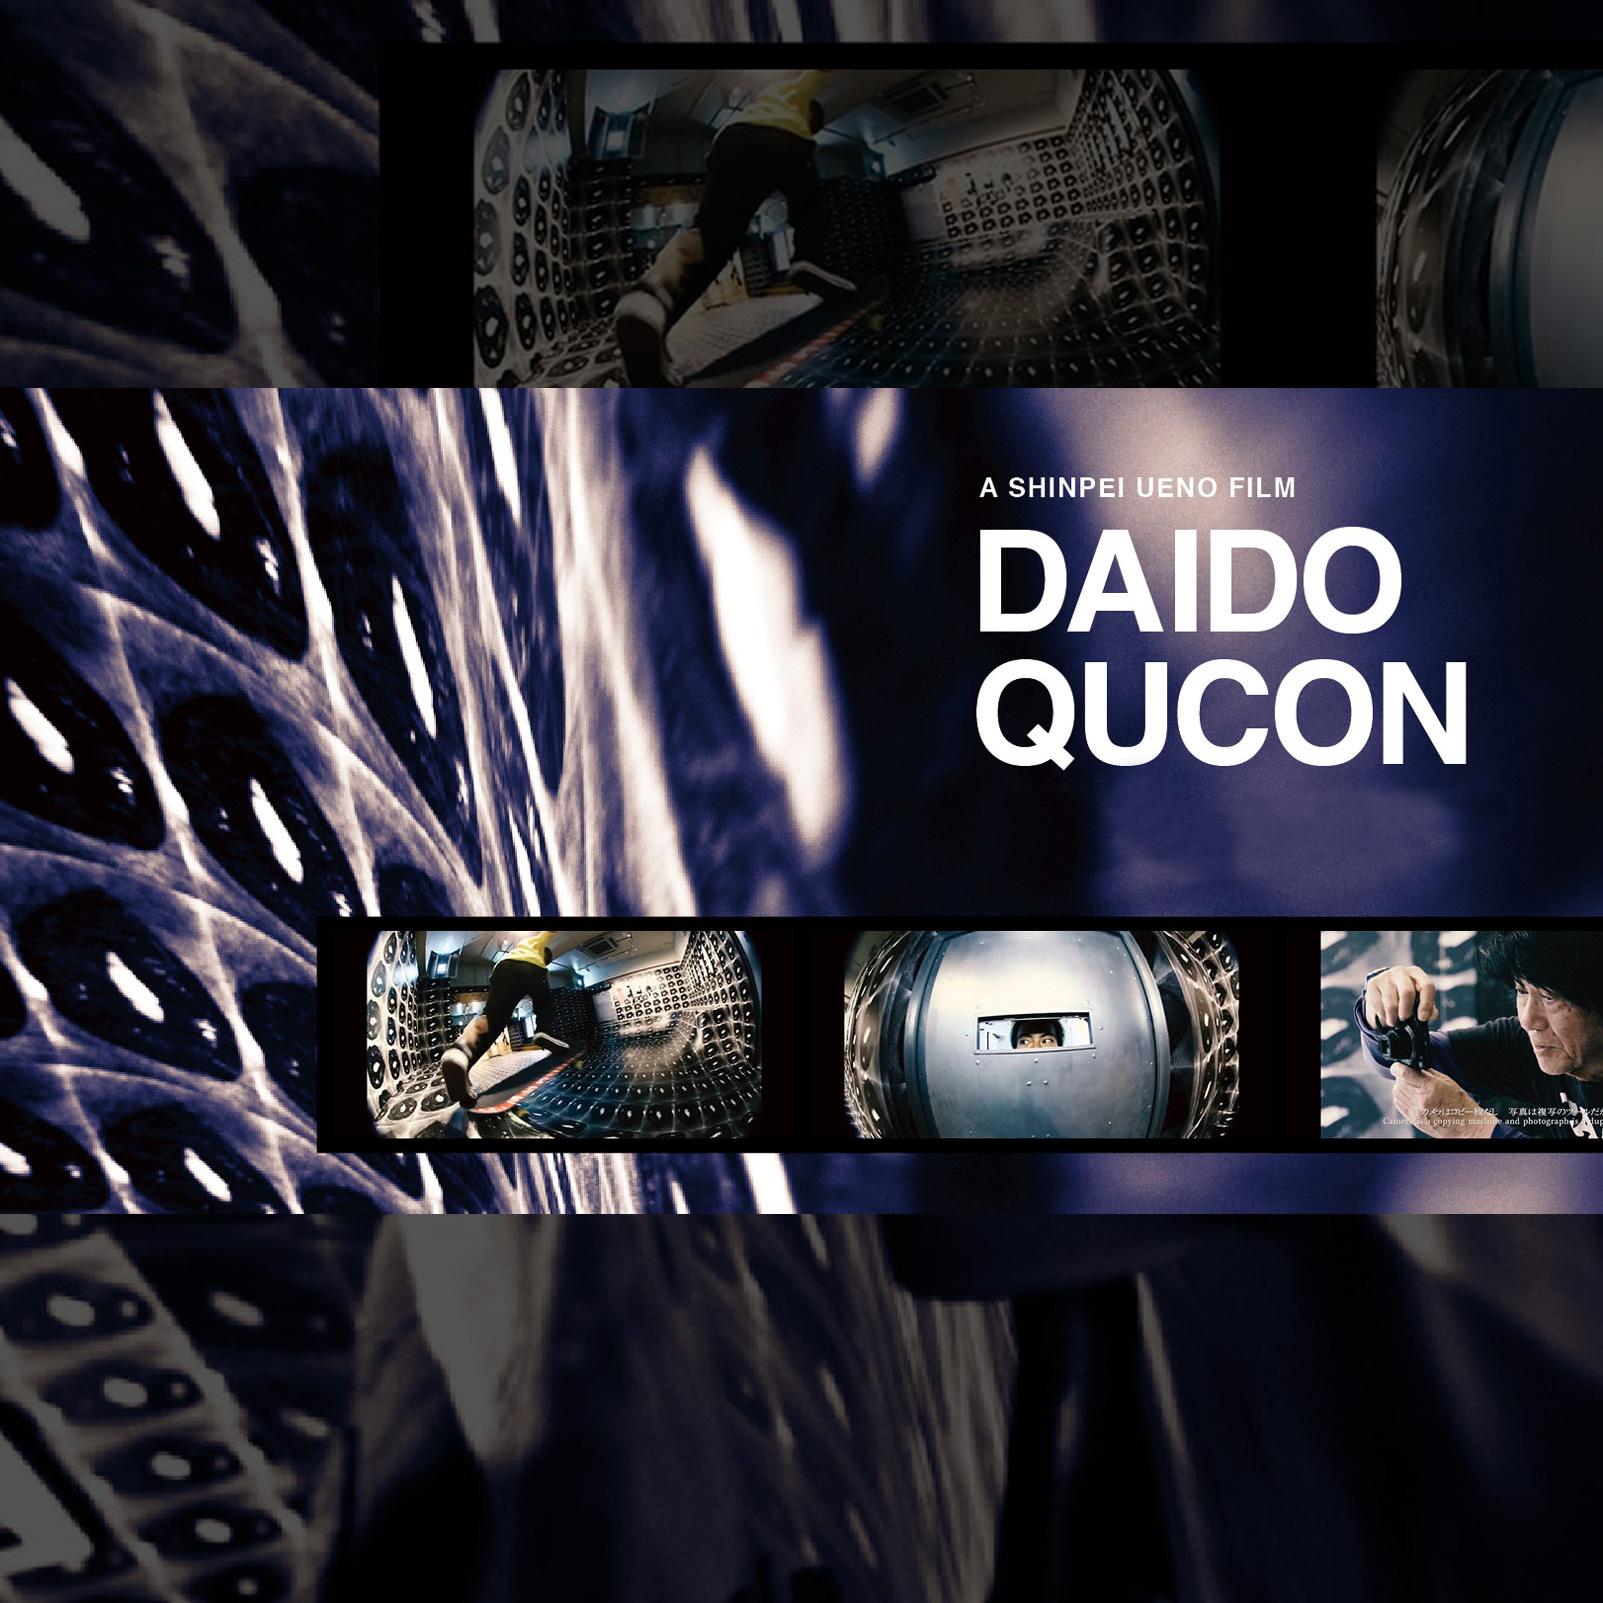 DAIDO x QUCON by SHINPEI UENO